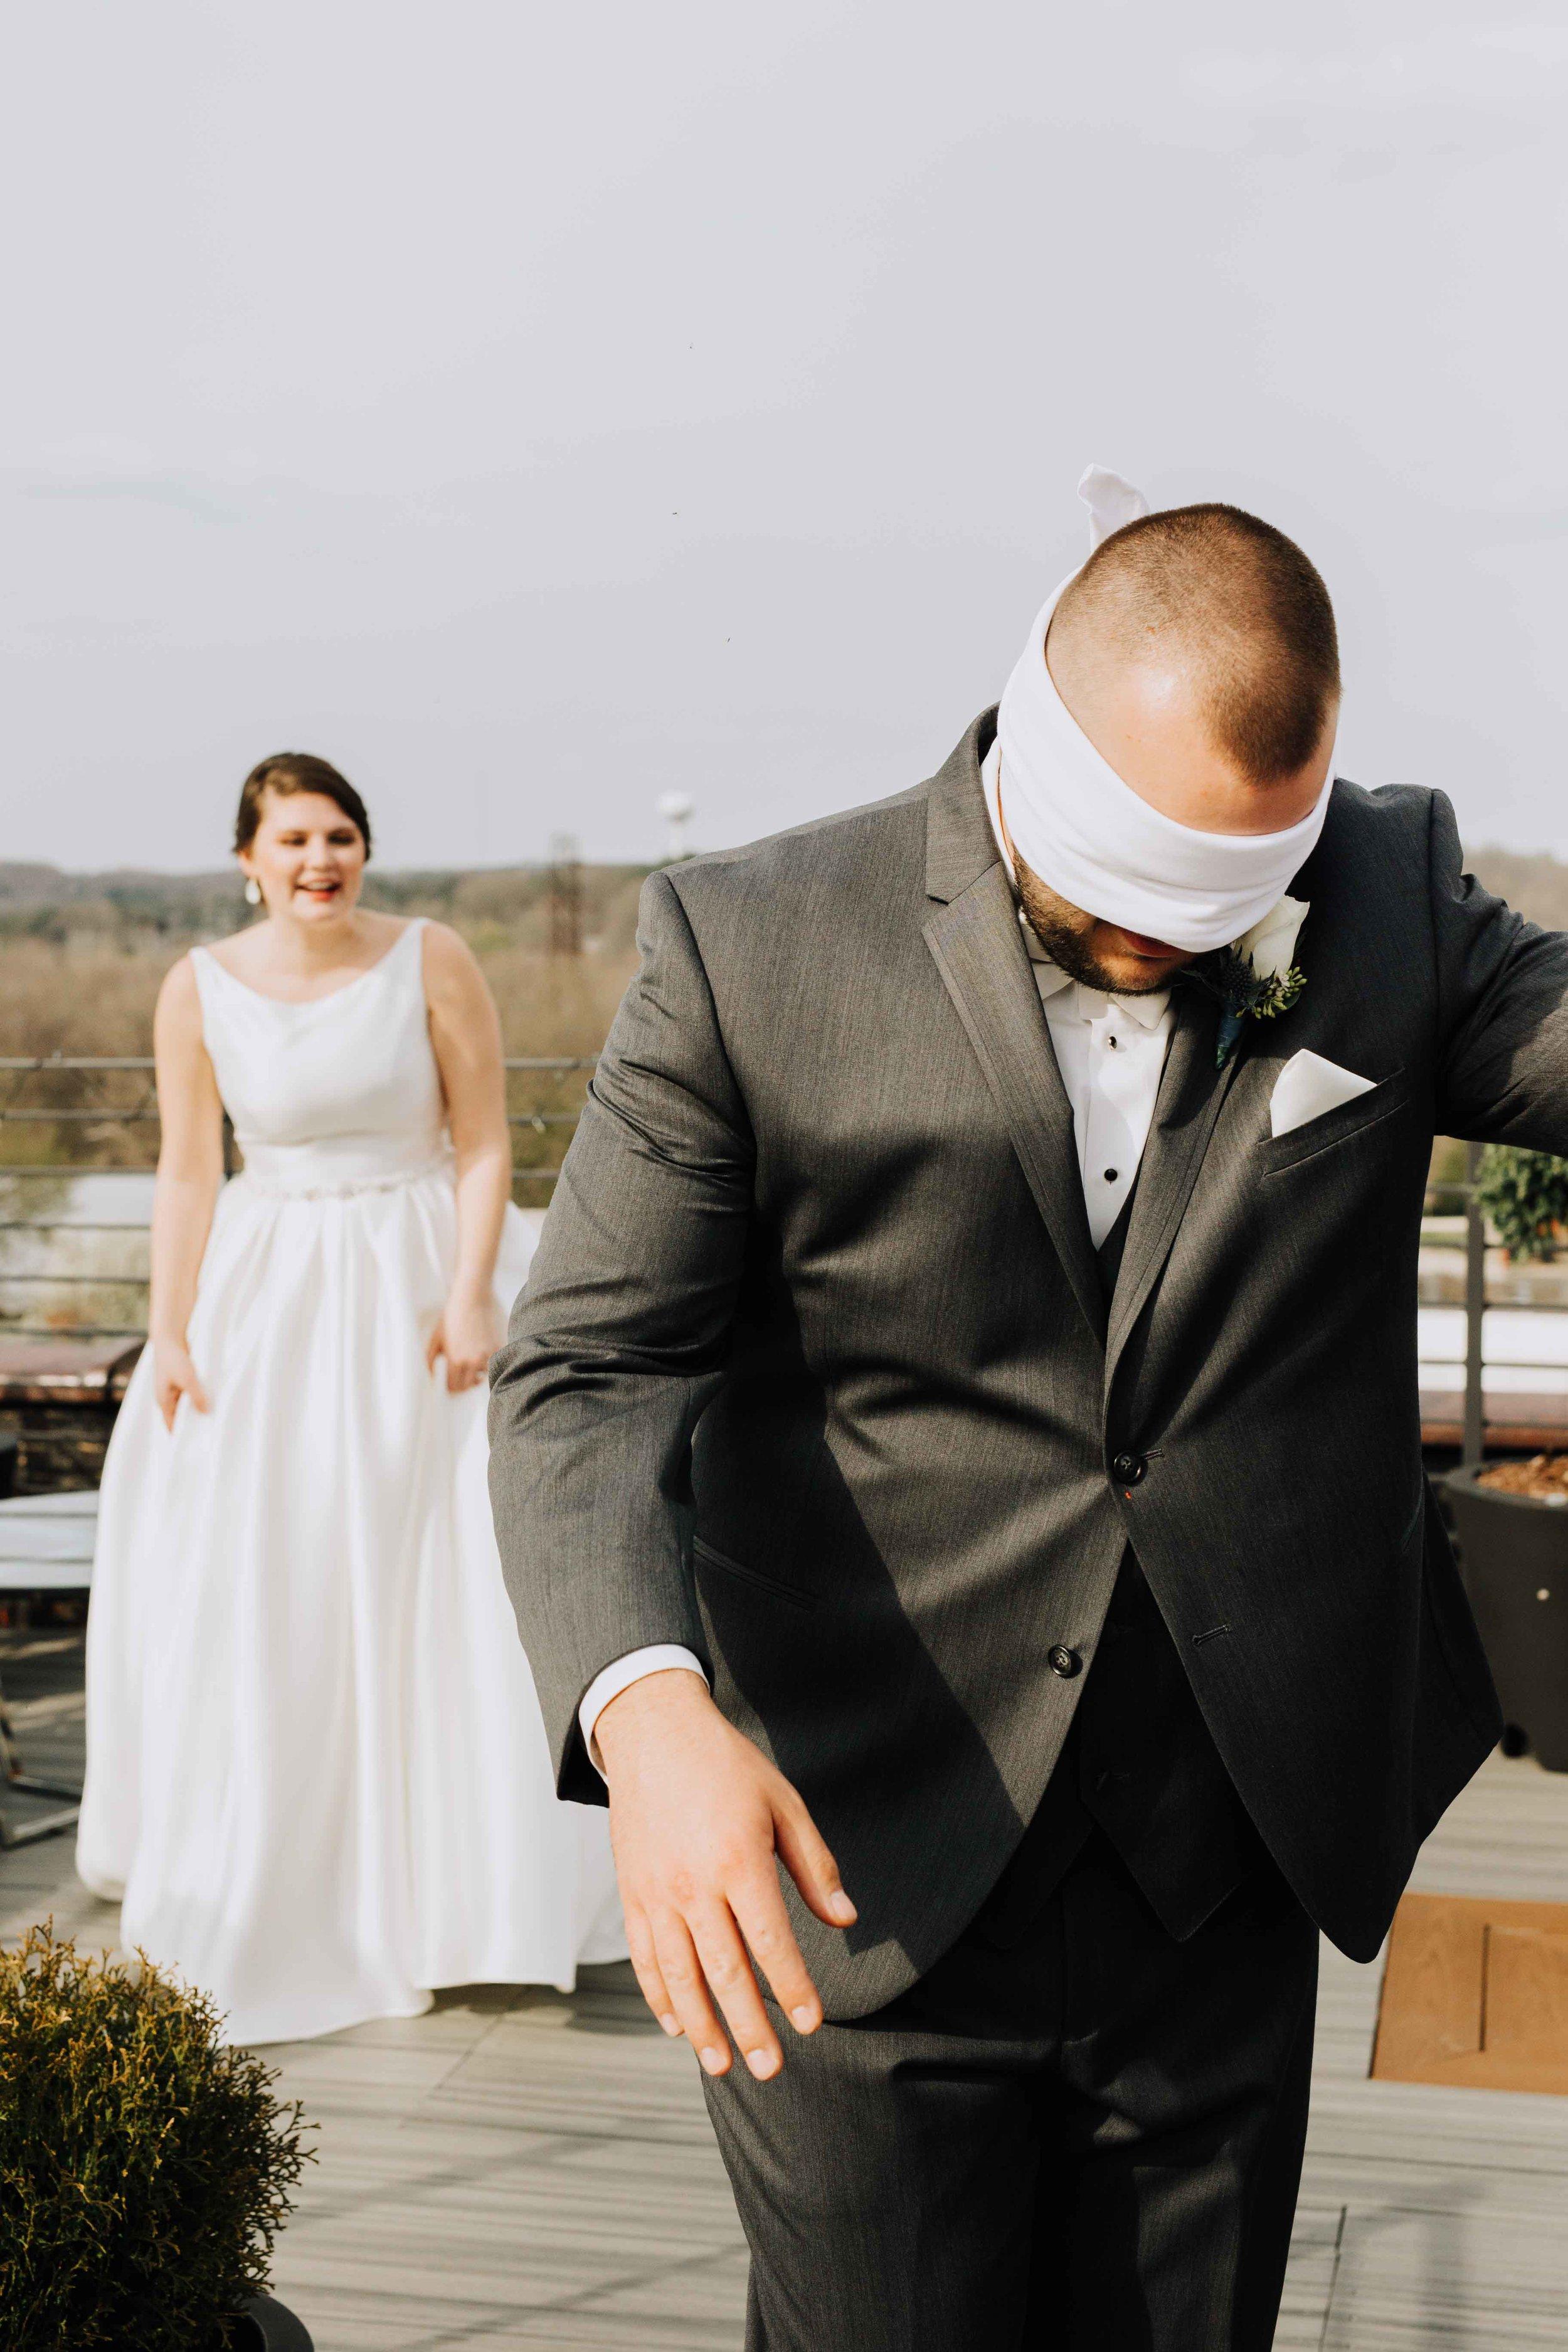 Farmville-Virginia-Wedding-Hotel-Weynoke-Downtown-Jacqueline-Waters-Photography-Detailed- (607).jpg